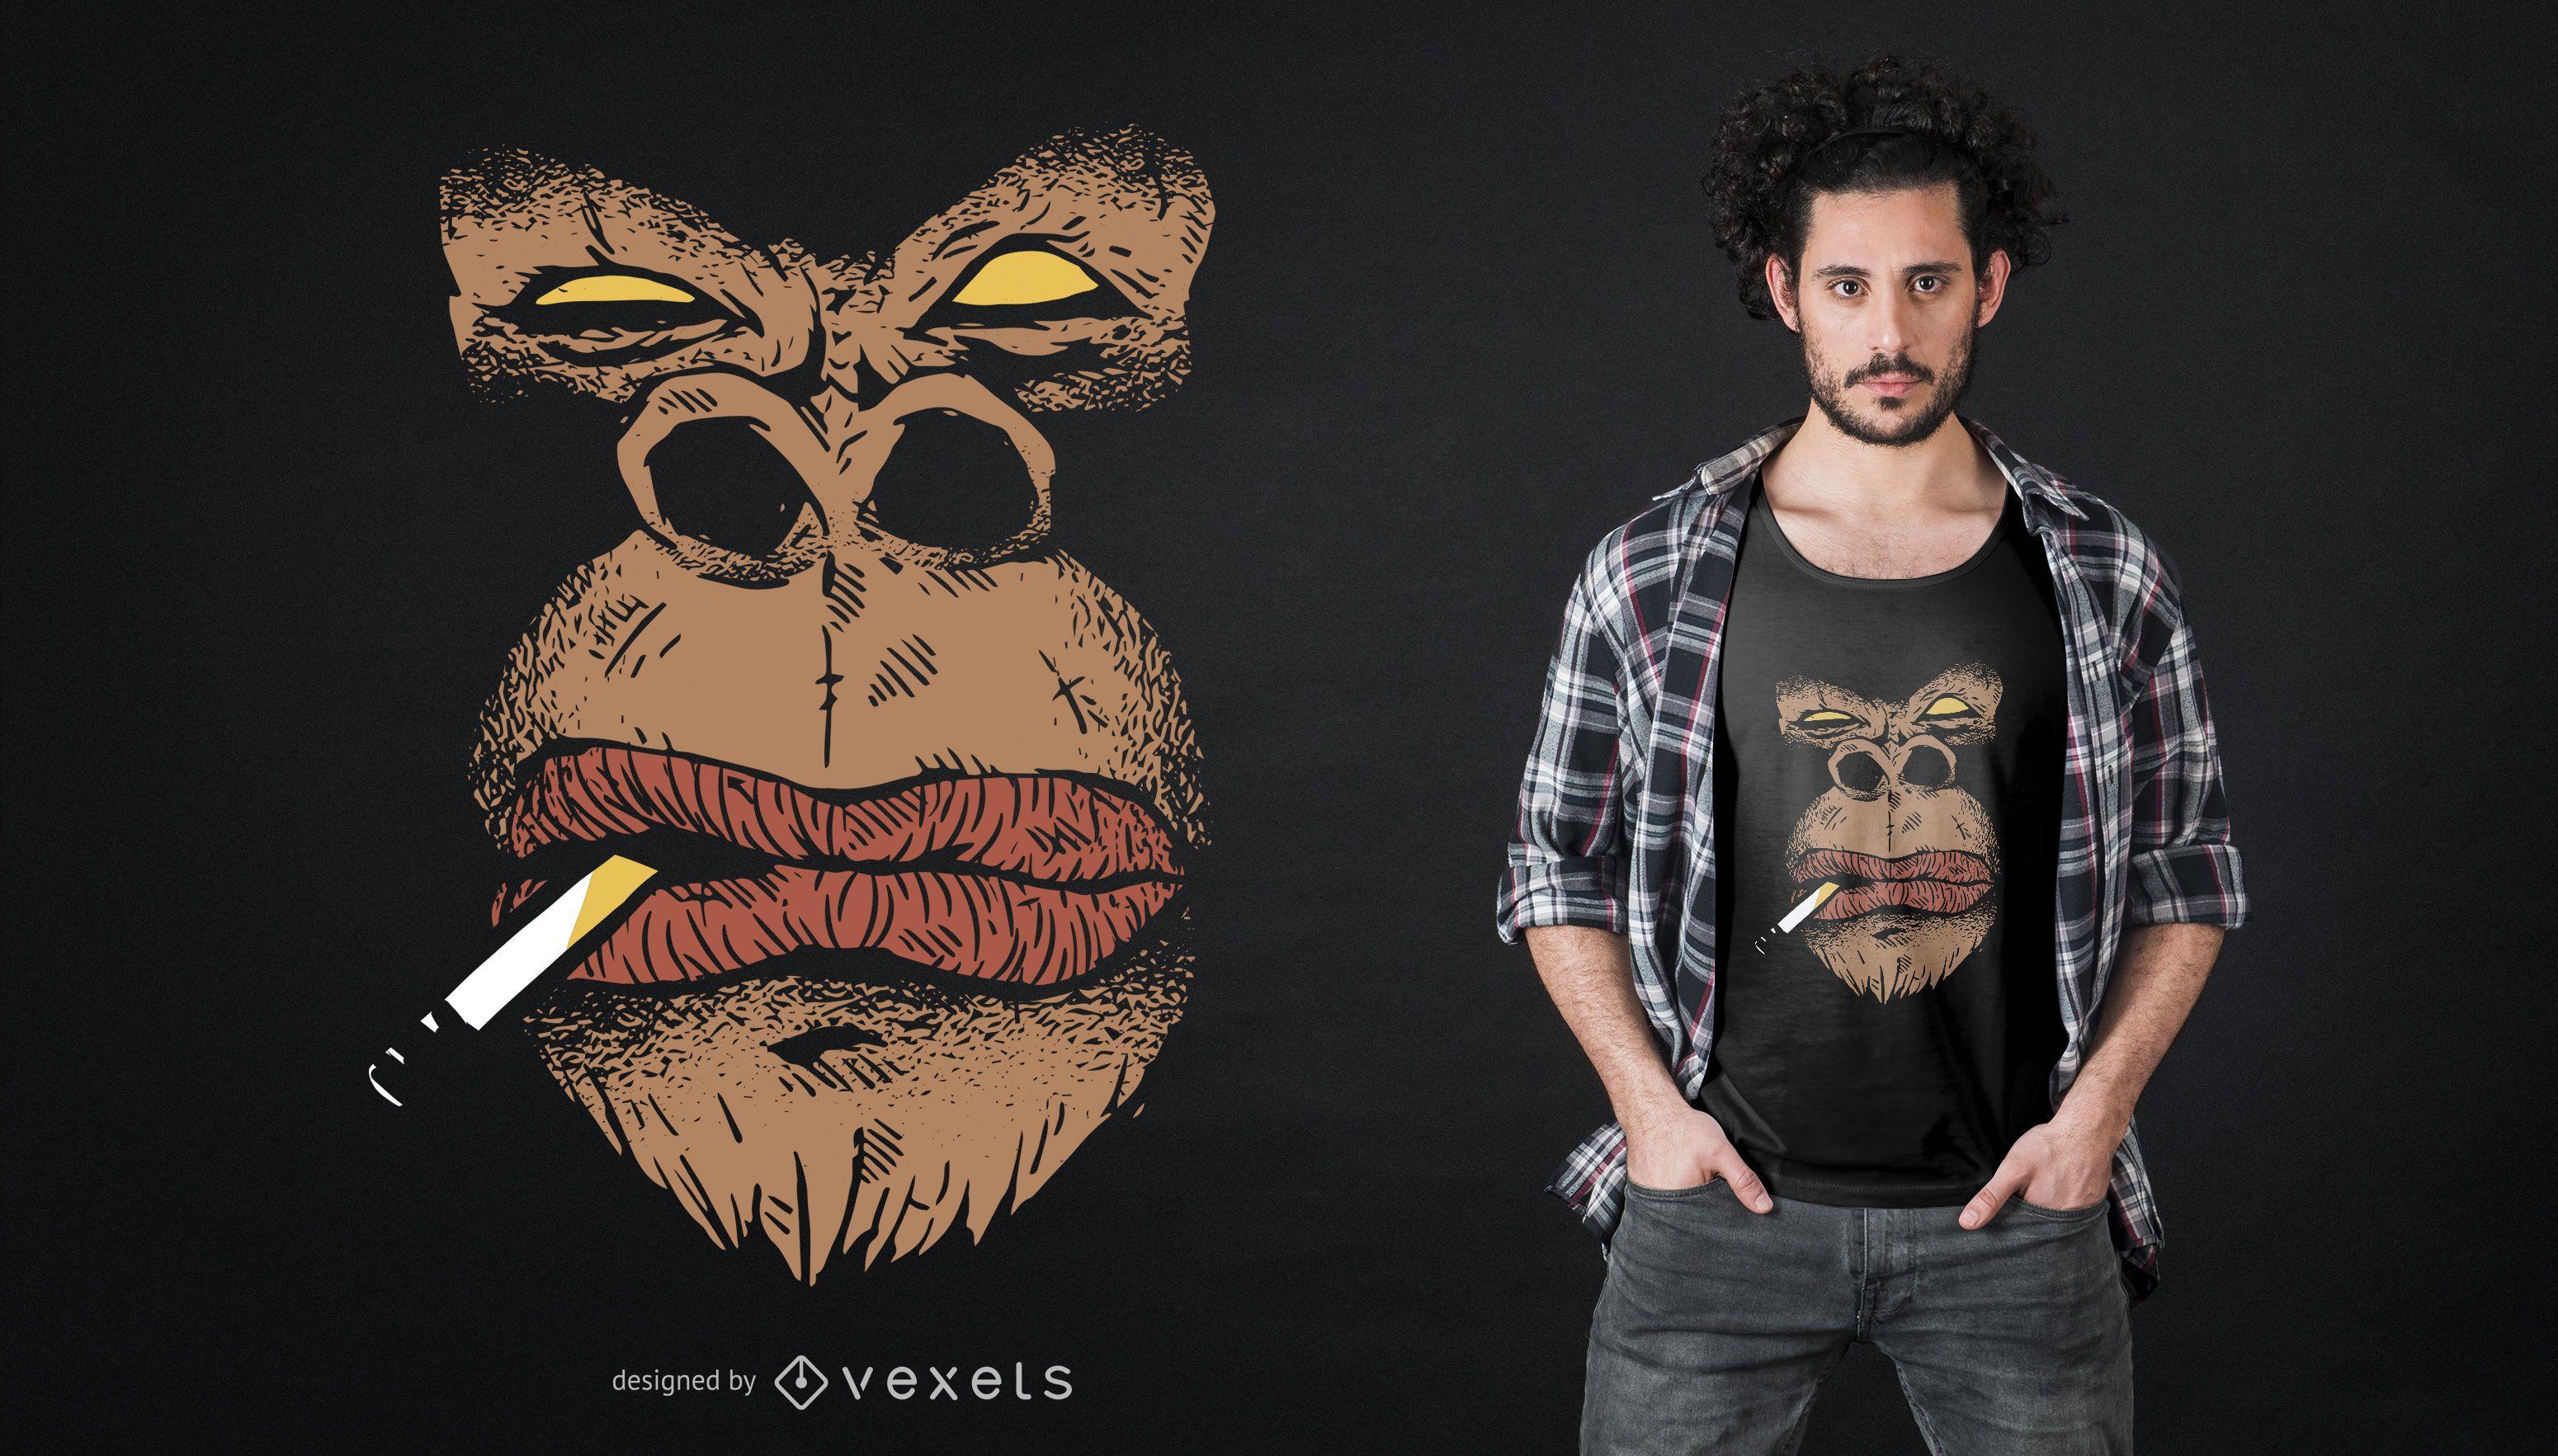 Angry Gorilla T-Shirt Design